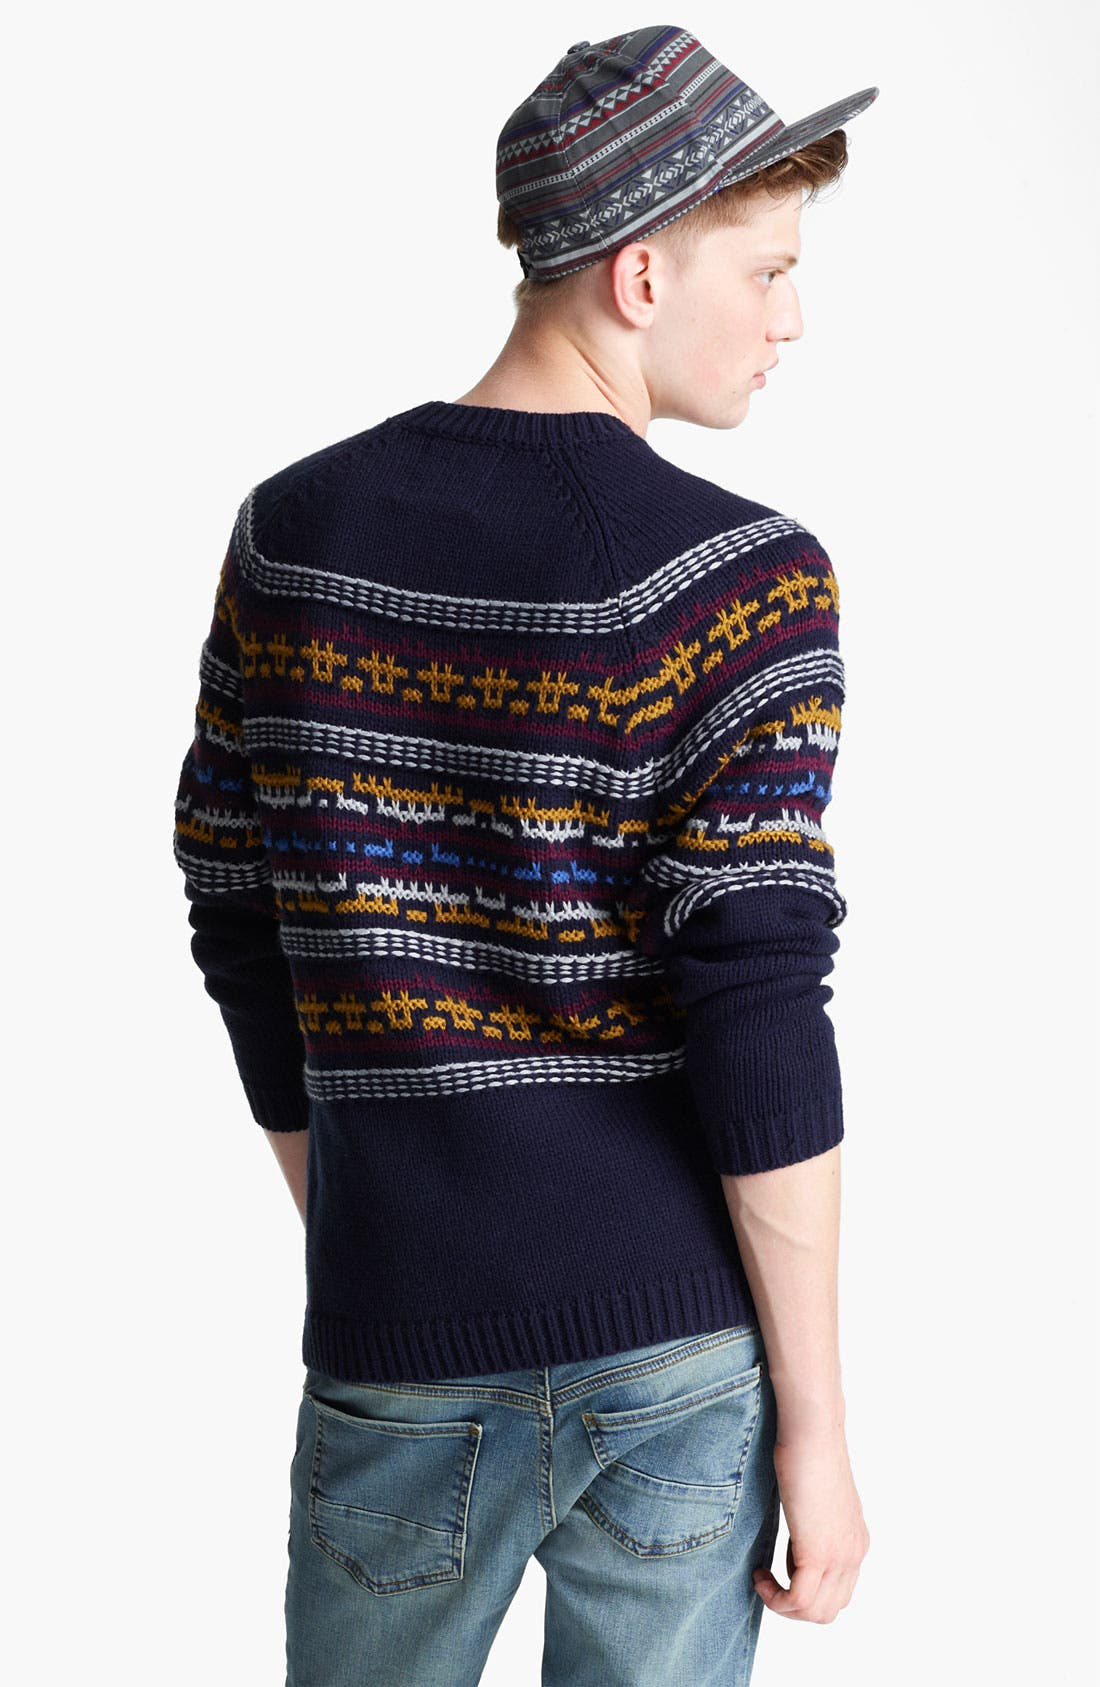 TOPMAN, 'Computer Pattern' Crewneck Sweater, Alternate thumbnail 3, color, 410